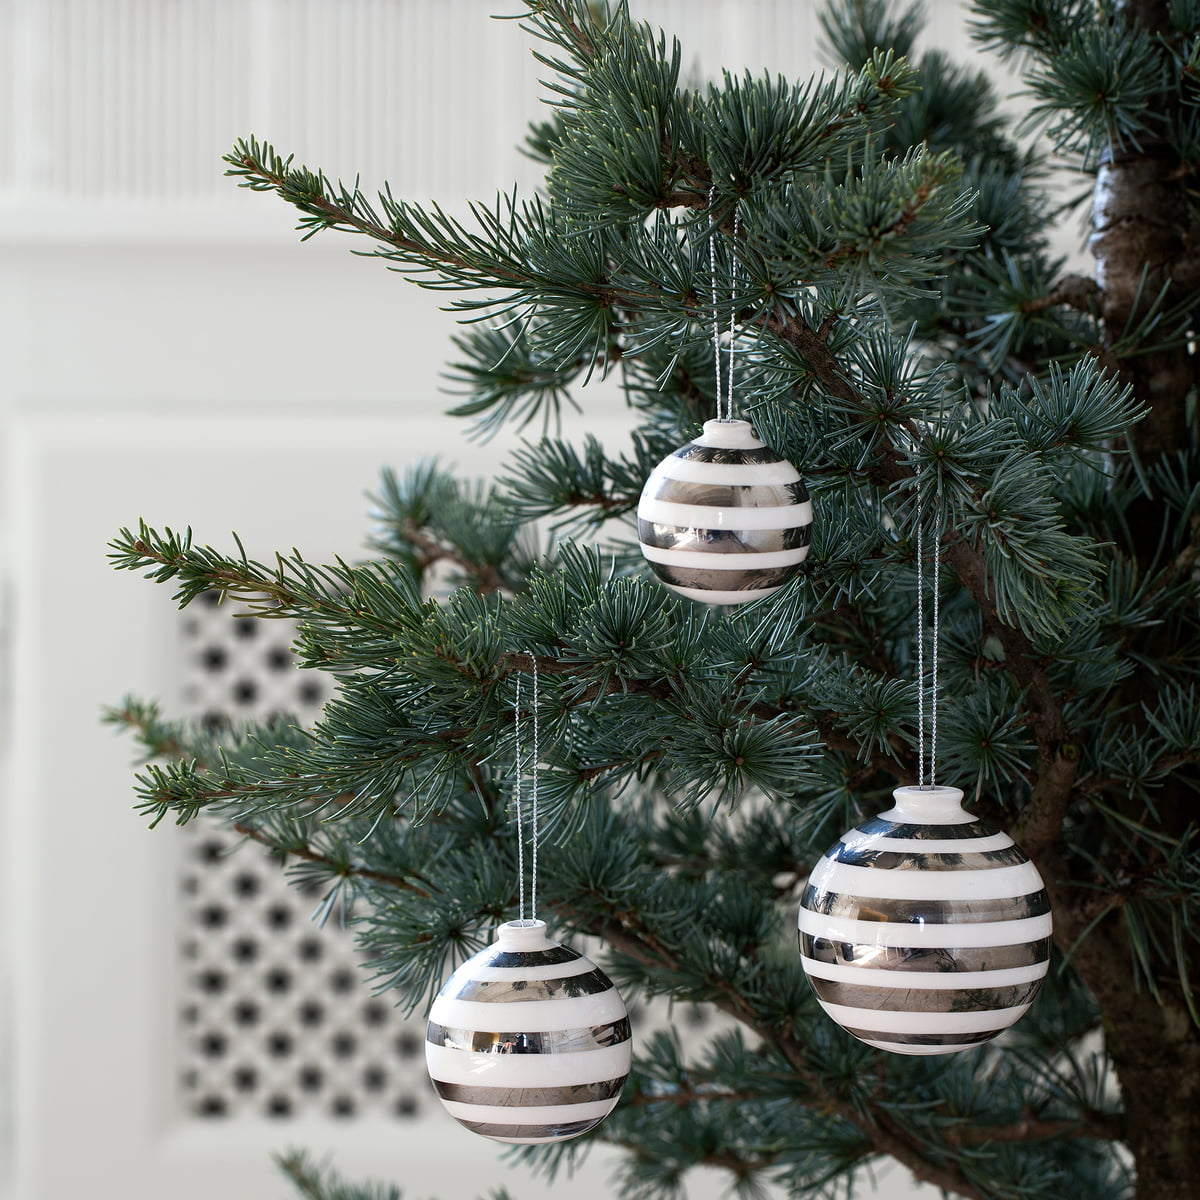 Bauhaus Christbaumkugeln.Kähler Design Omaggio Christmas Tree Baubles Nacre Set Of 3